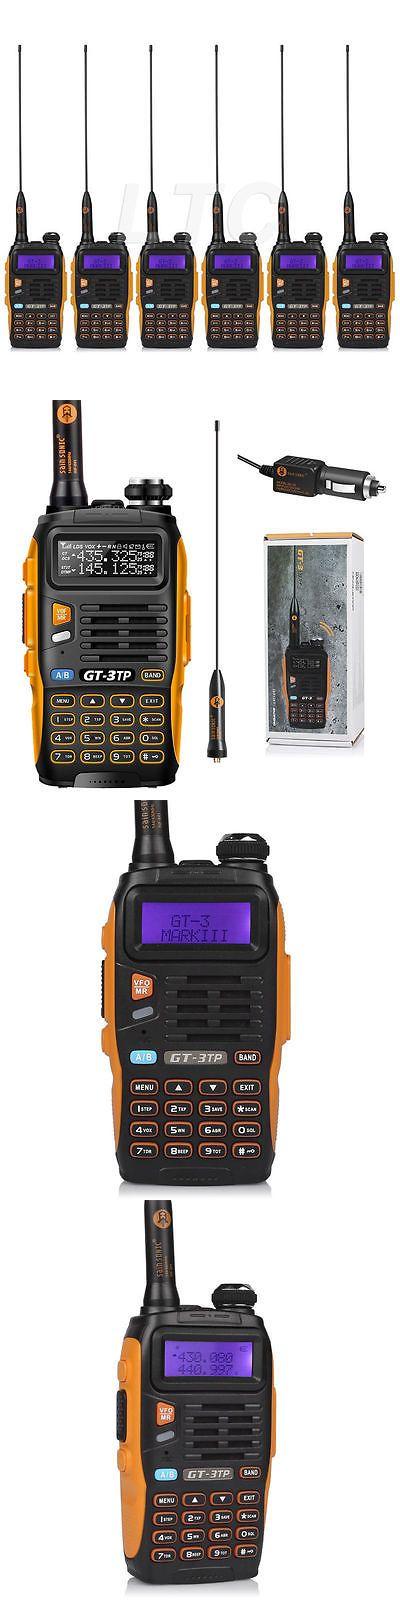 Walkie Talkies Two-Way Radios: Usa! 6X Baofeng Gt-3Tp Mark Iii V Uhf 1 4 8W Fm Walkie Talkie Ham Two-Way Radio -> BUY IT NOW ONLY: $189.99 on eBay!